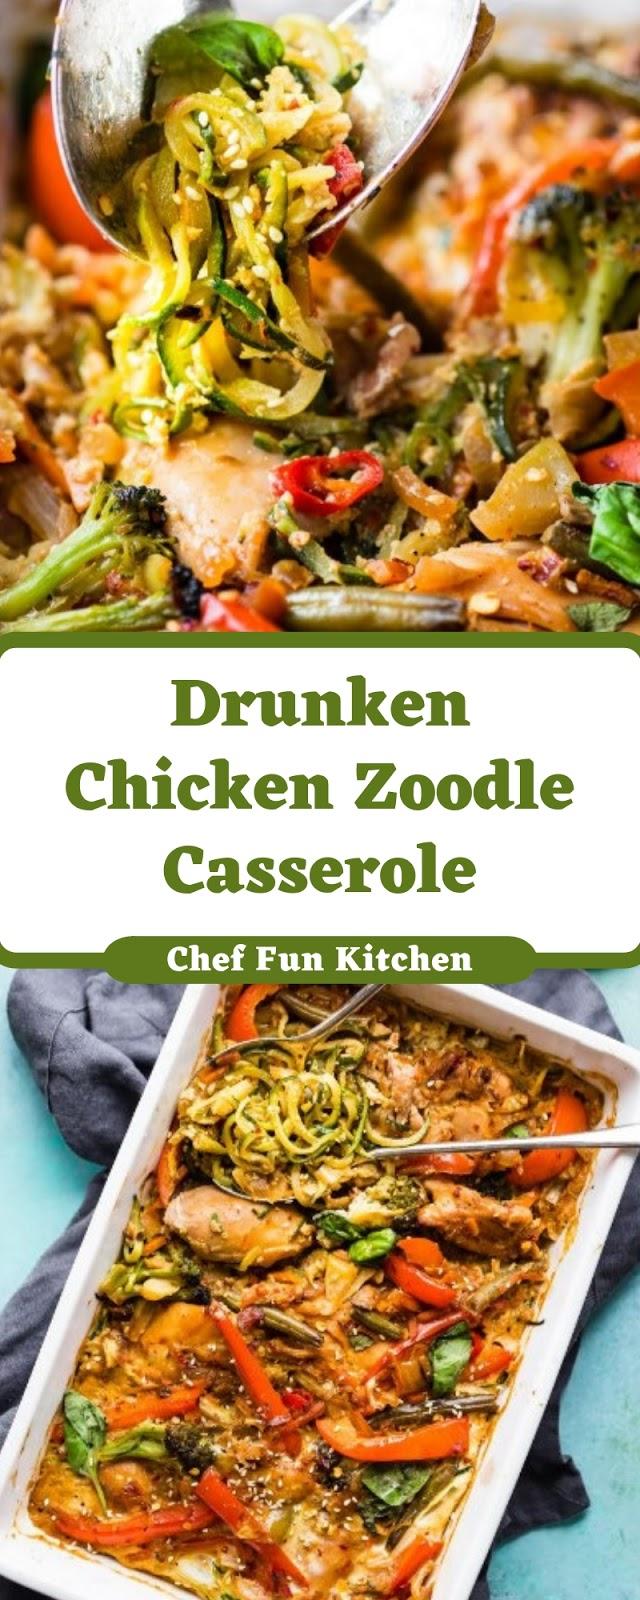 Drunken Chicken Zoodle Casserole